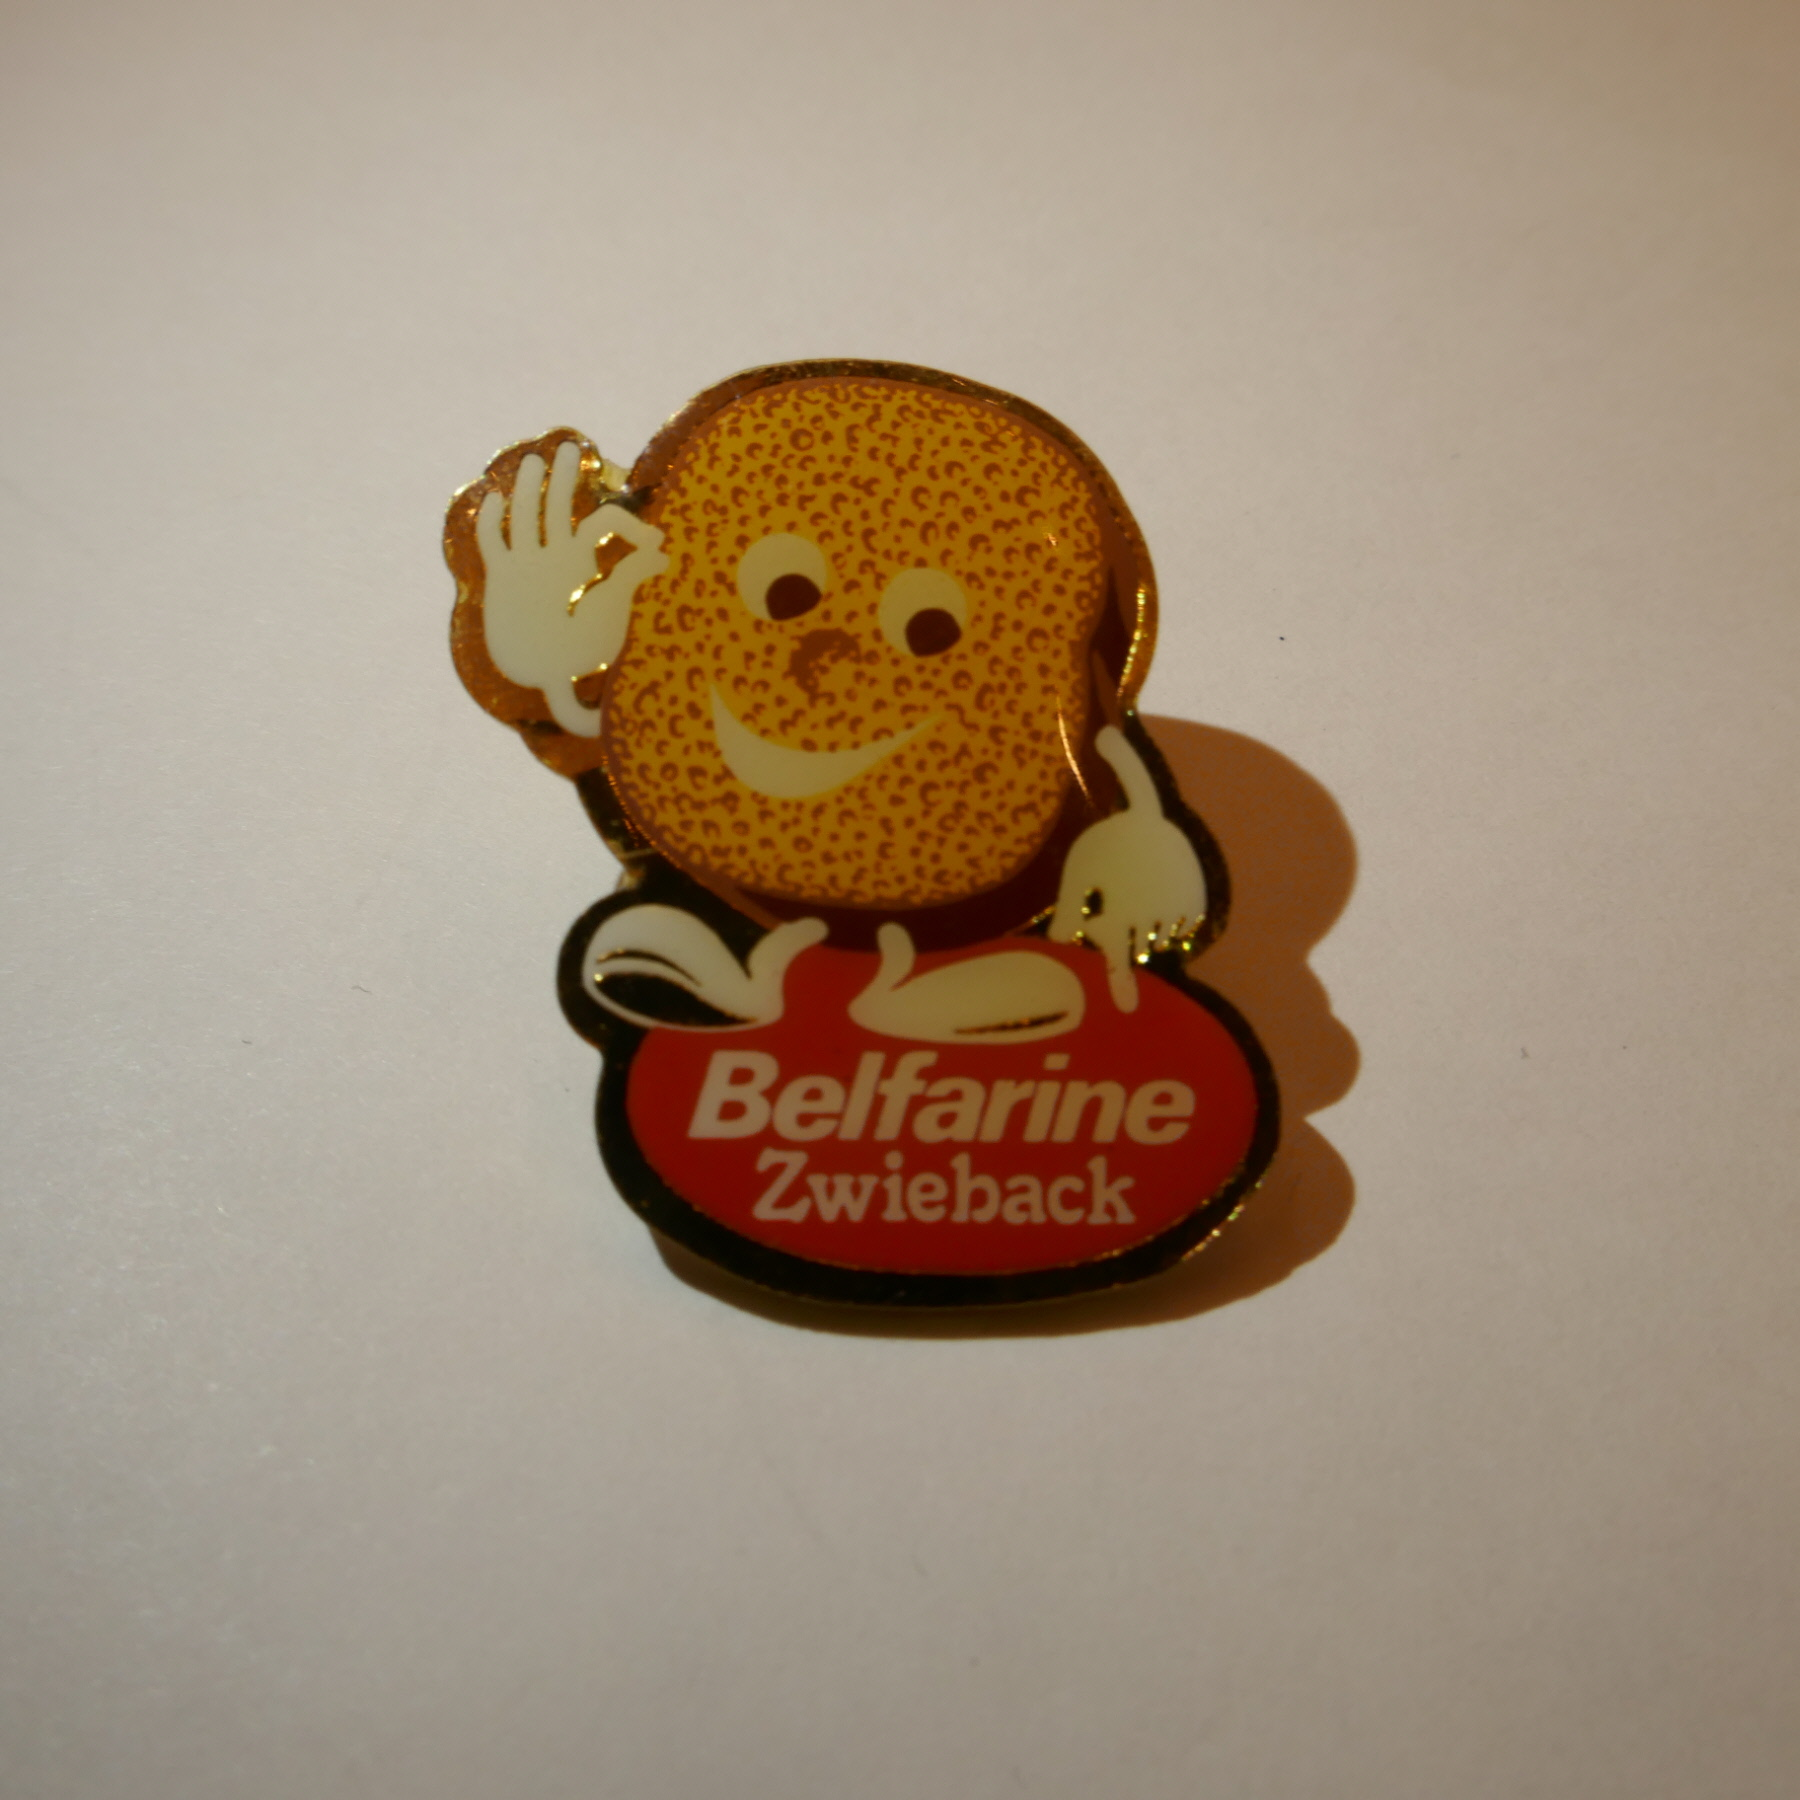 Belfarine Zwieback Breadboy pins